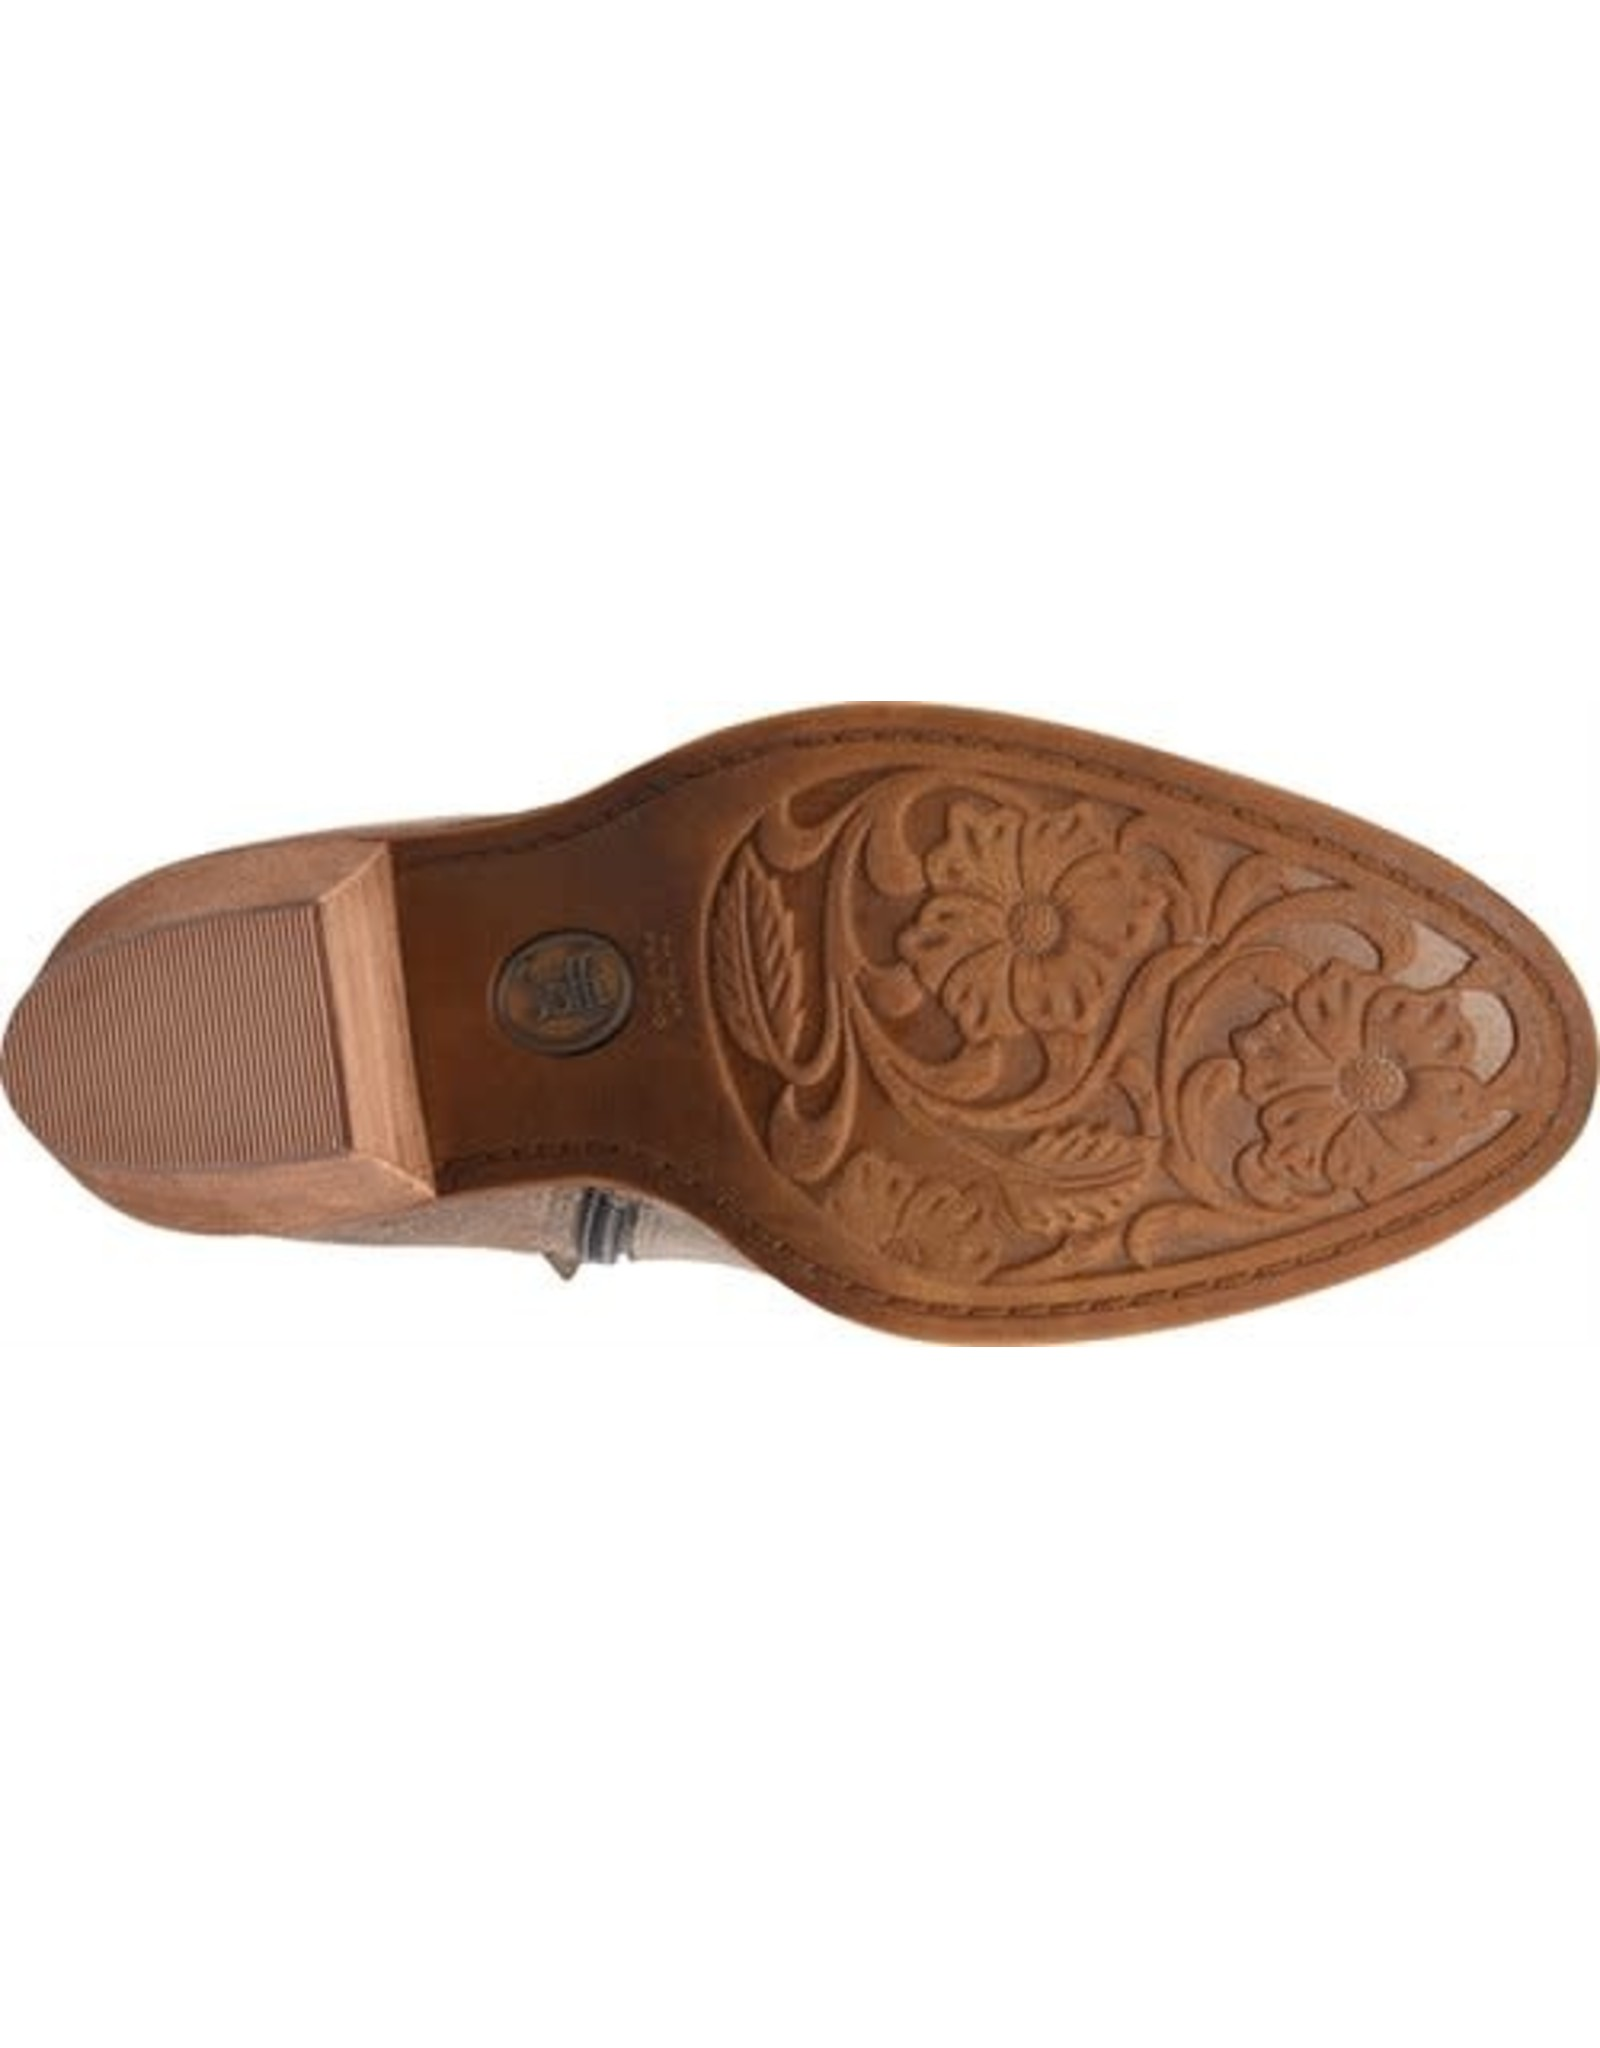 SOFFT Tilton Ankle Boot